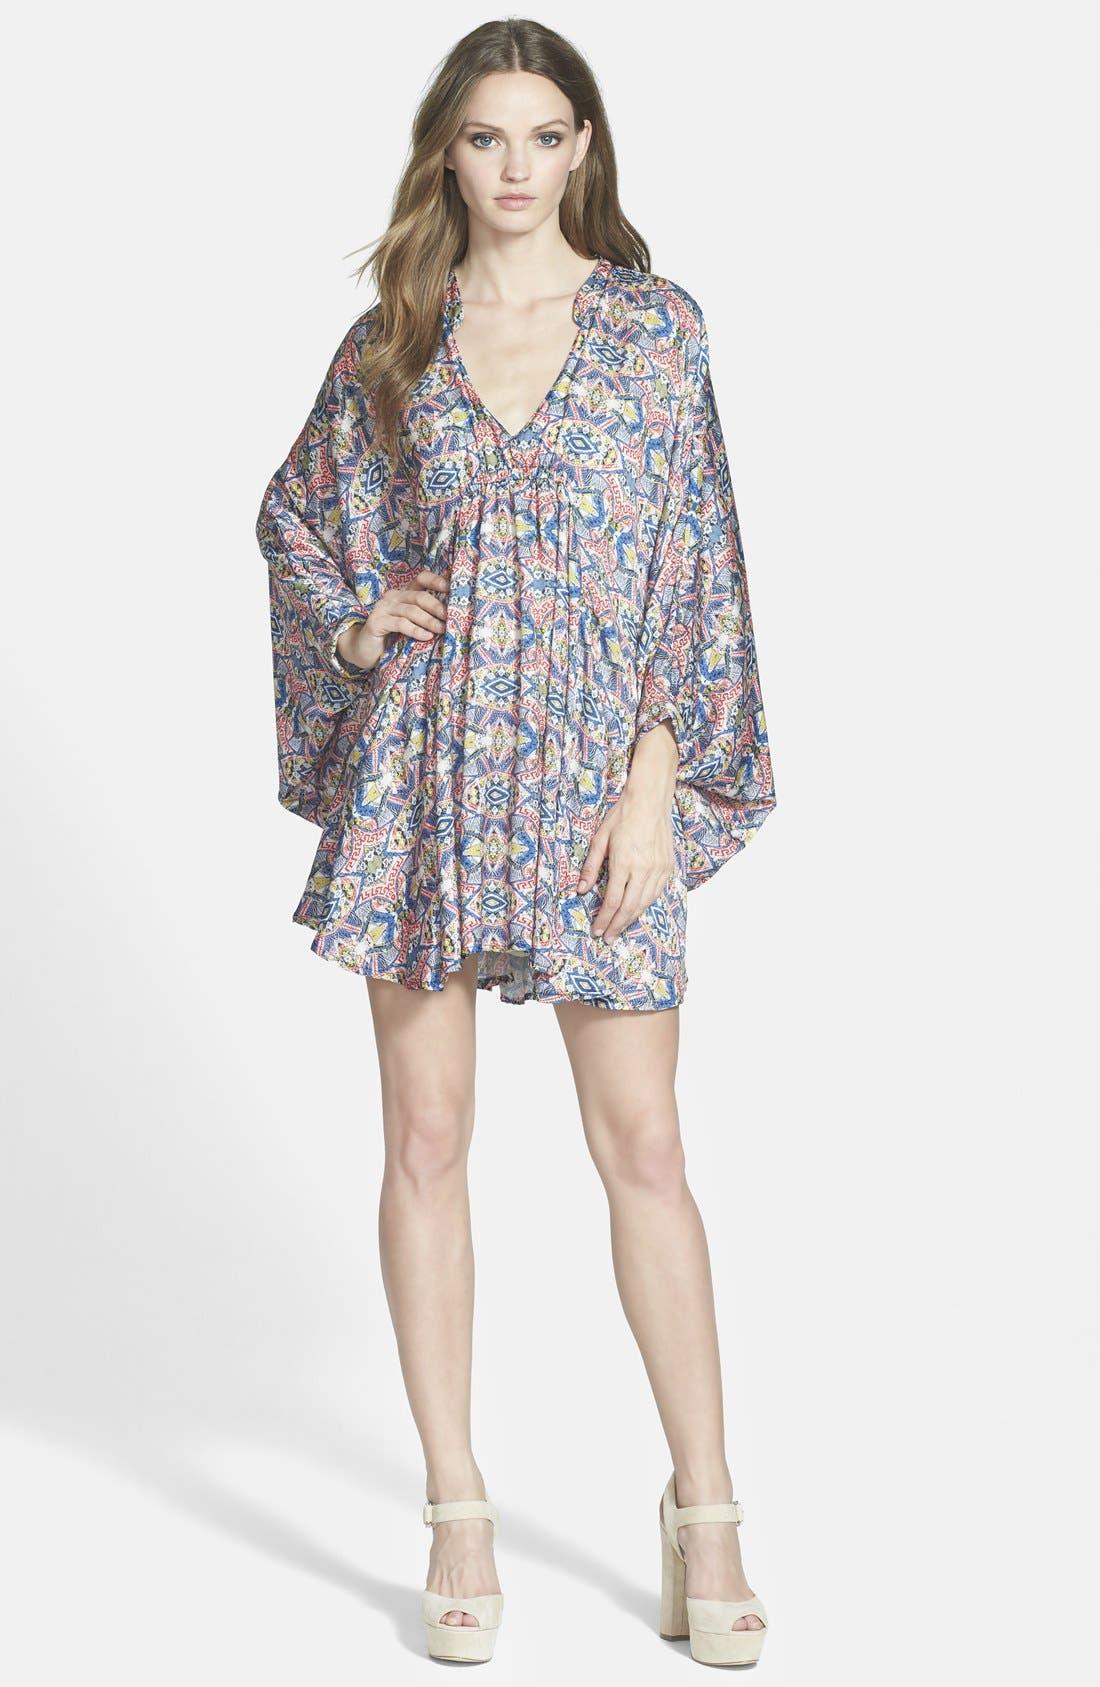 MAISIE, 'Lenore' Floral Print Kimono Dress, Main thumbnail 1, color, 001